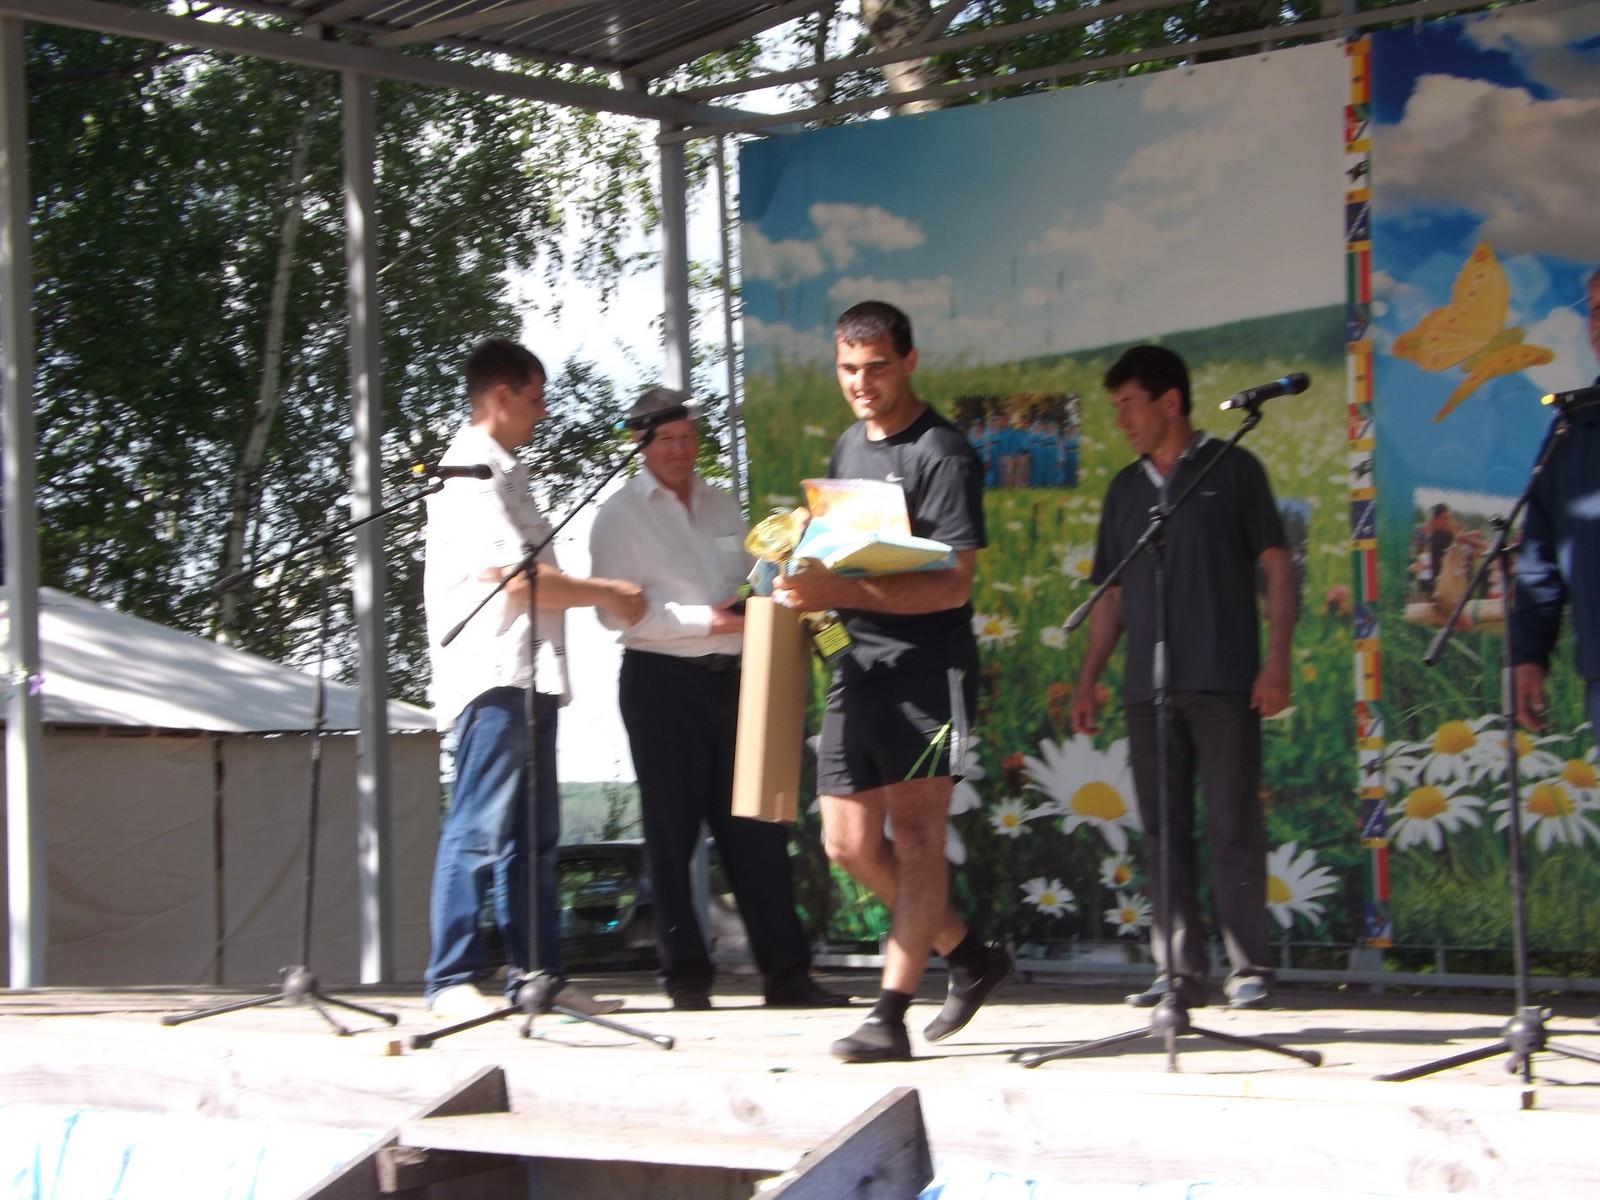 Sabantuy-2016-bor'ba-na-poyasax-i-dr-sostyazaniya-501-Bastanovo